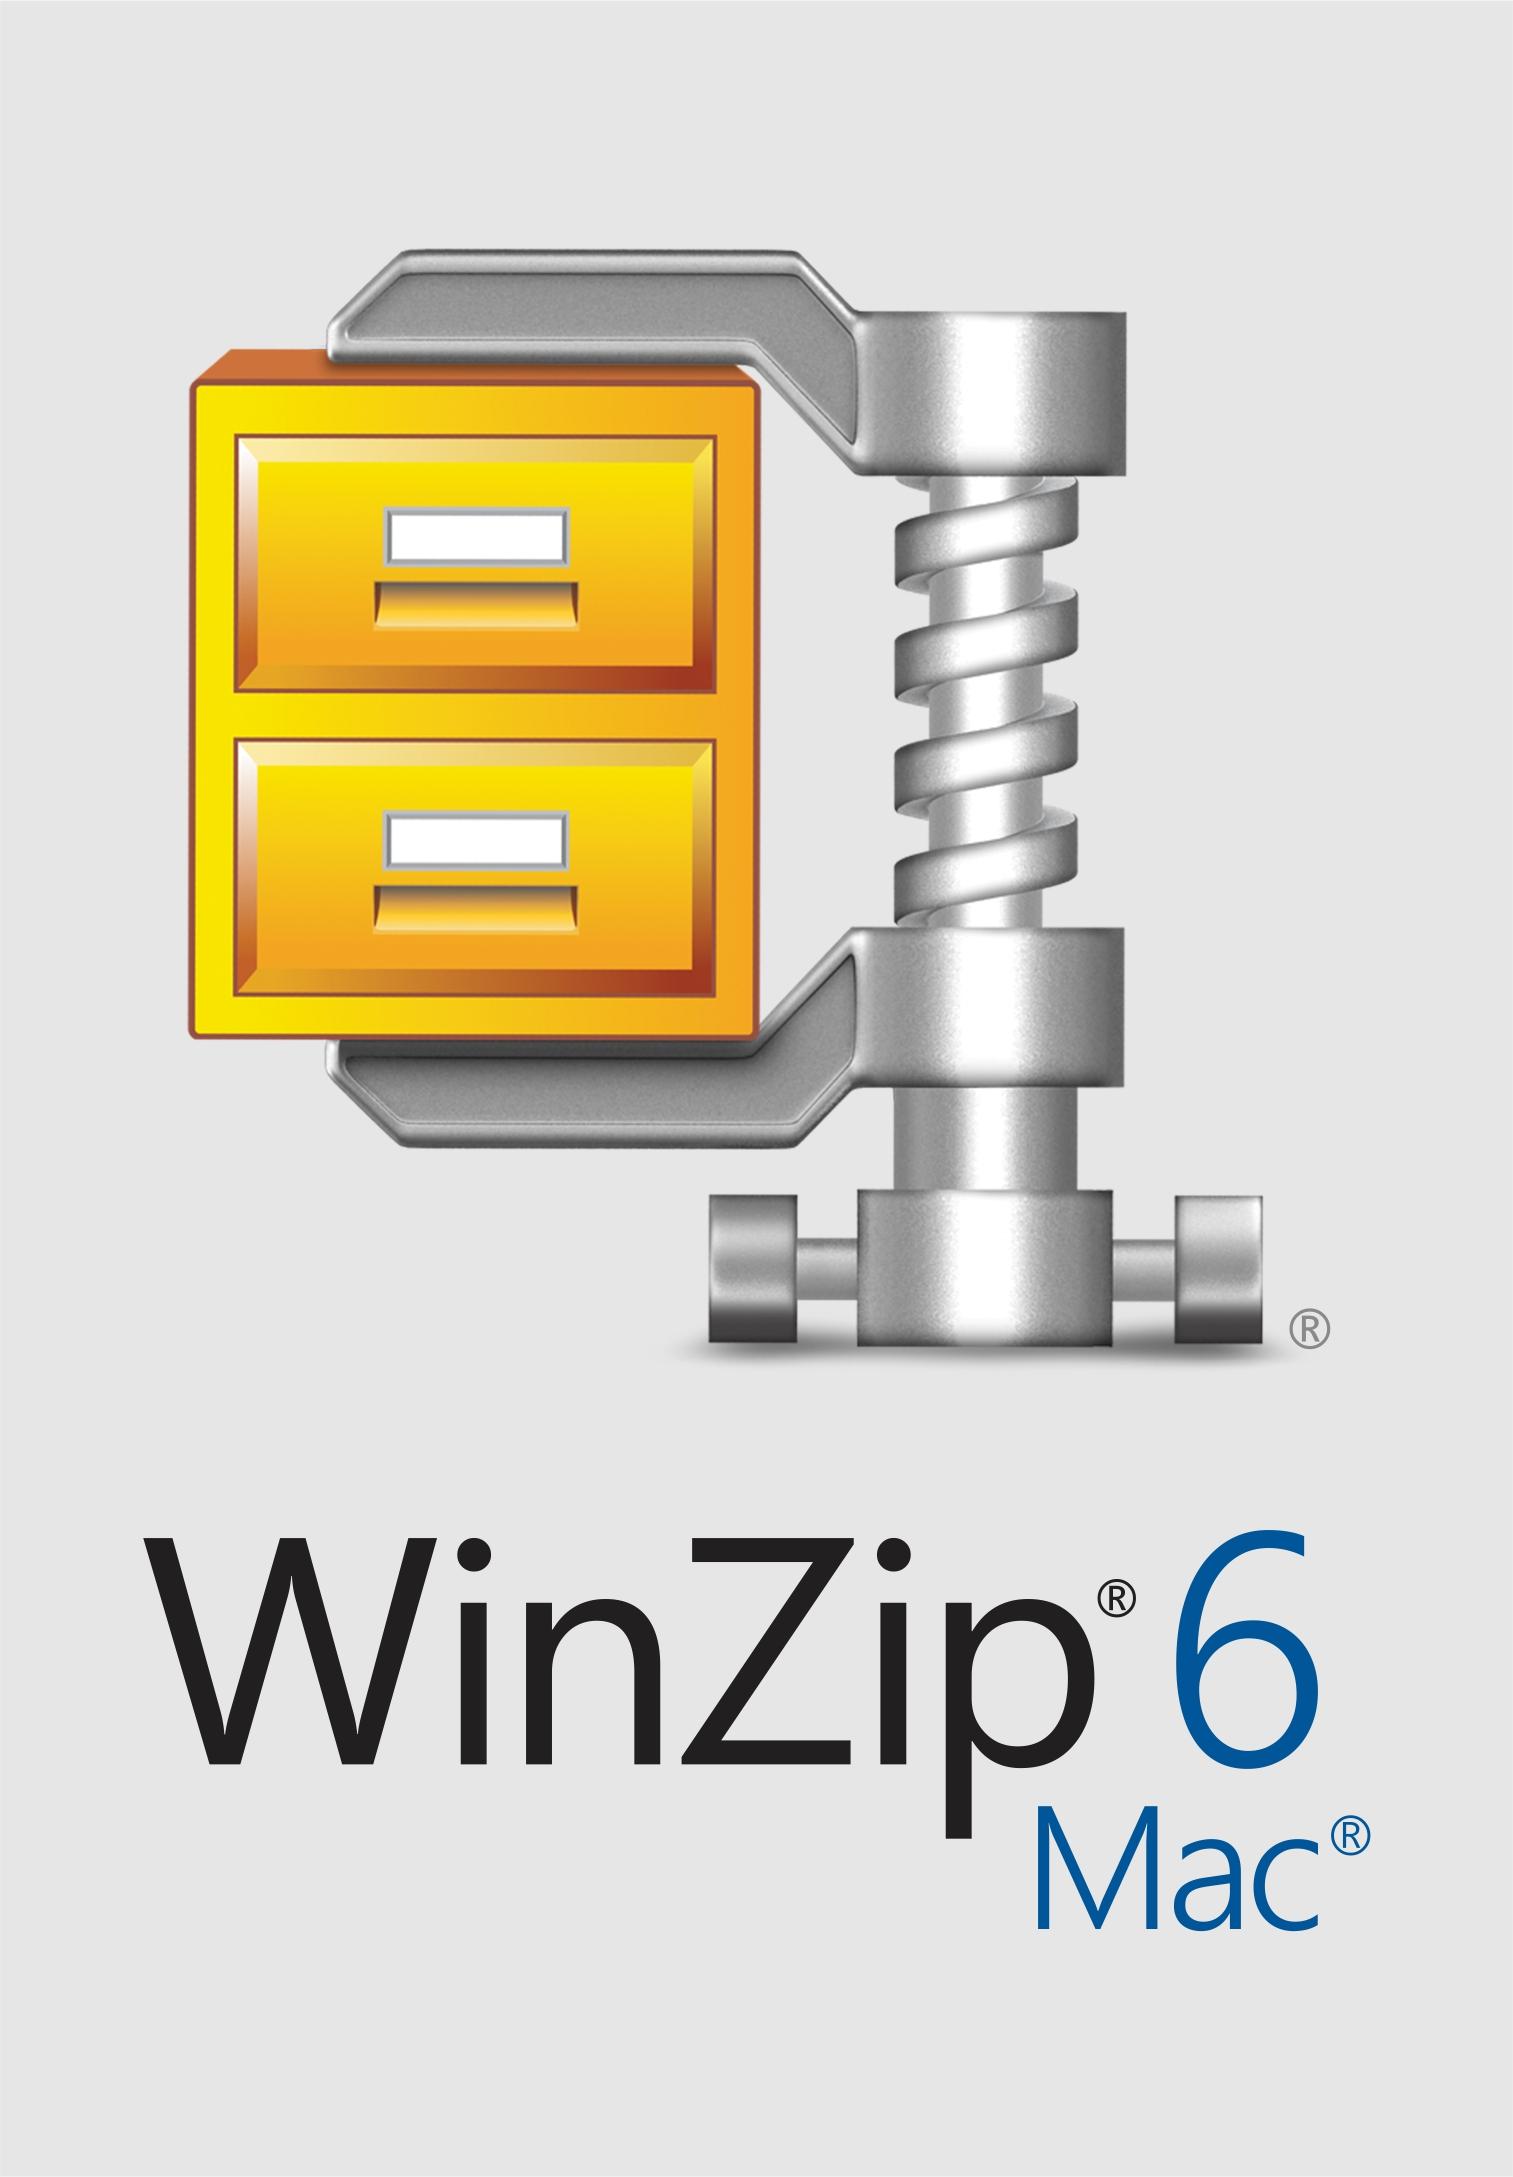 Winzip 6 File Compression And Decompression Software For Mac  Download